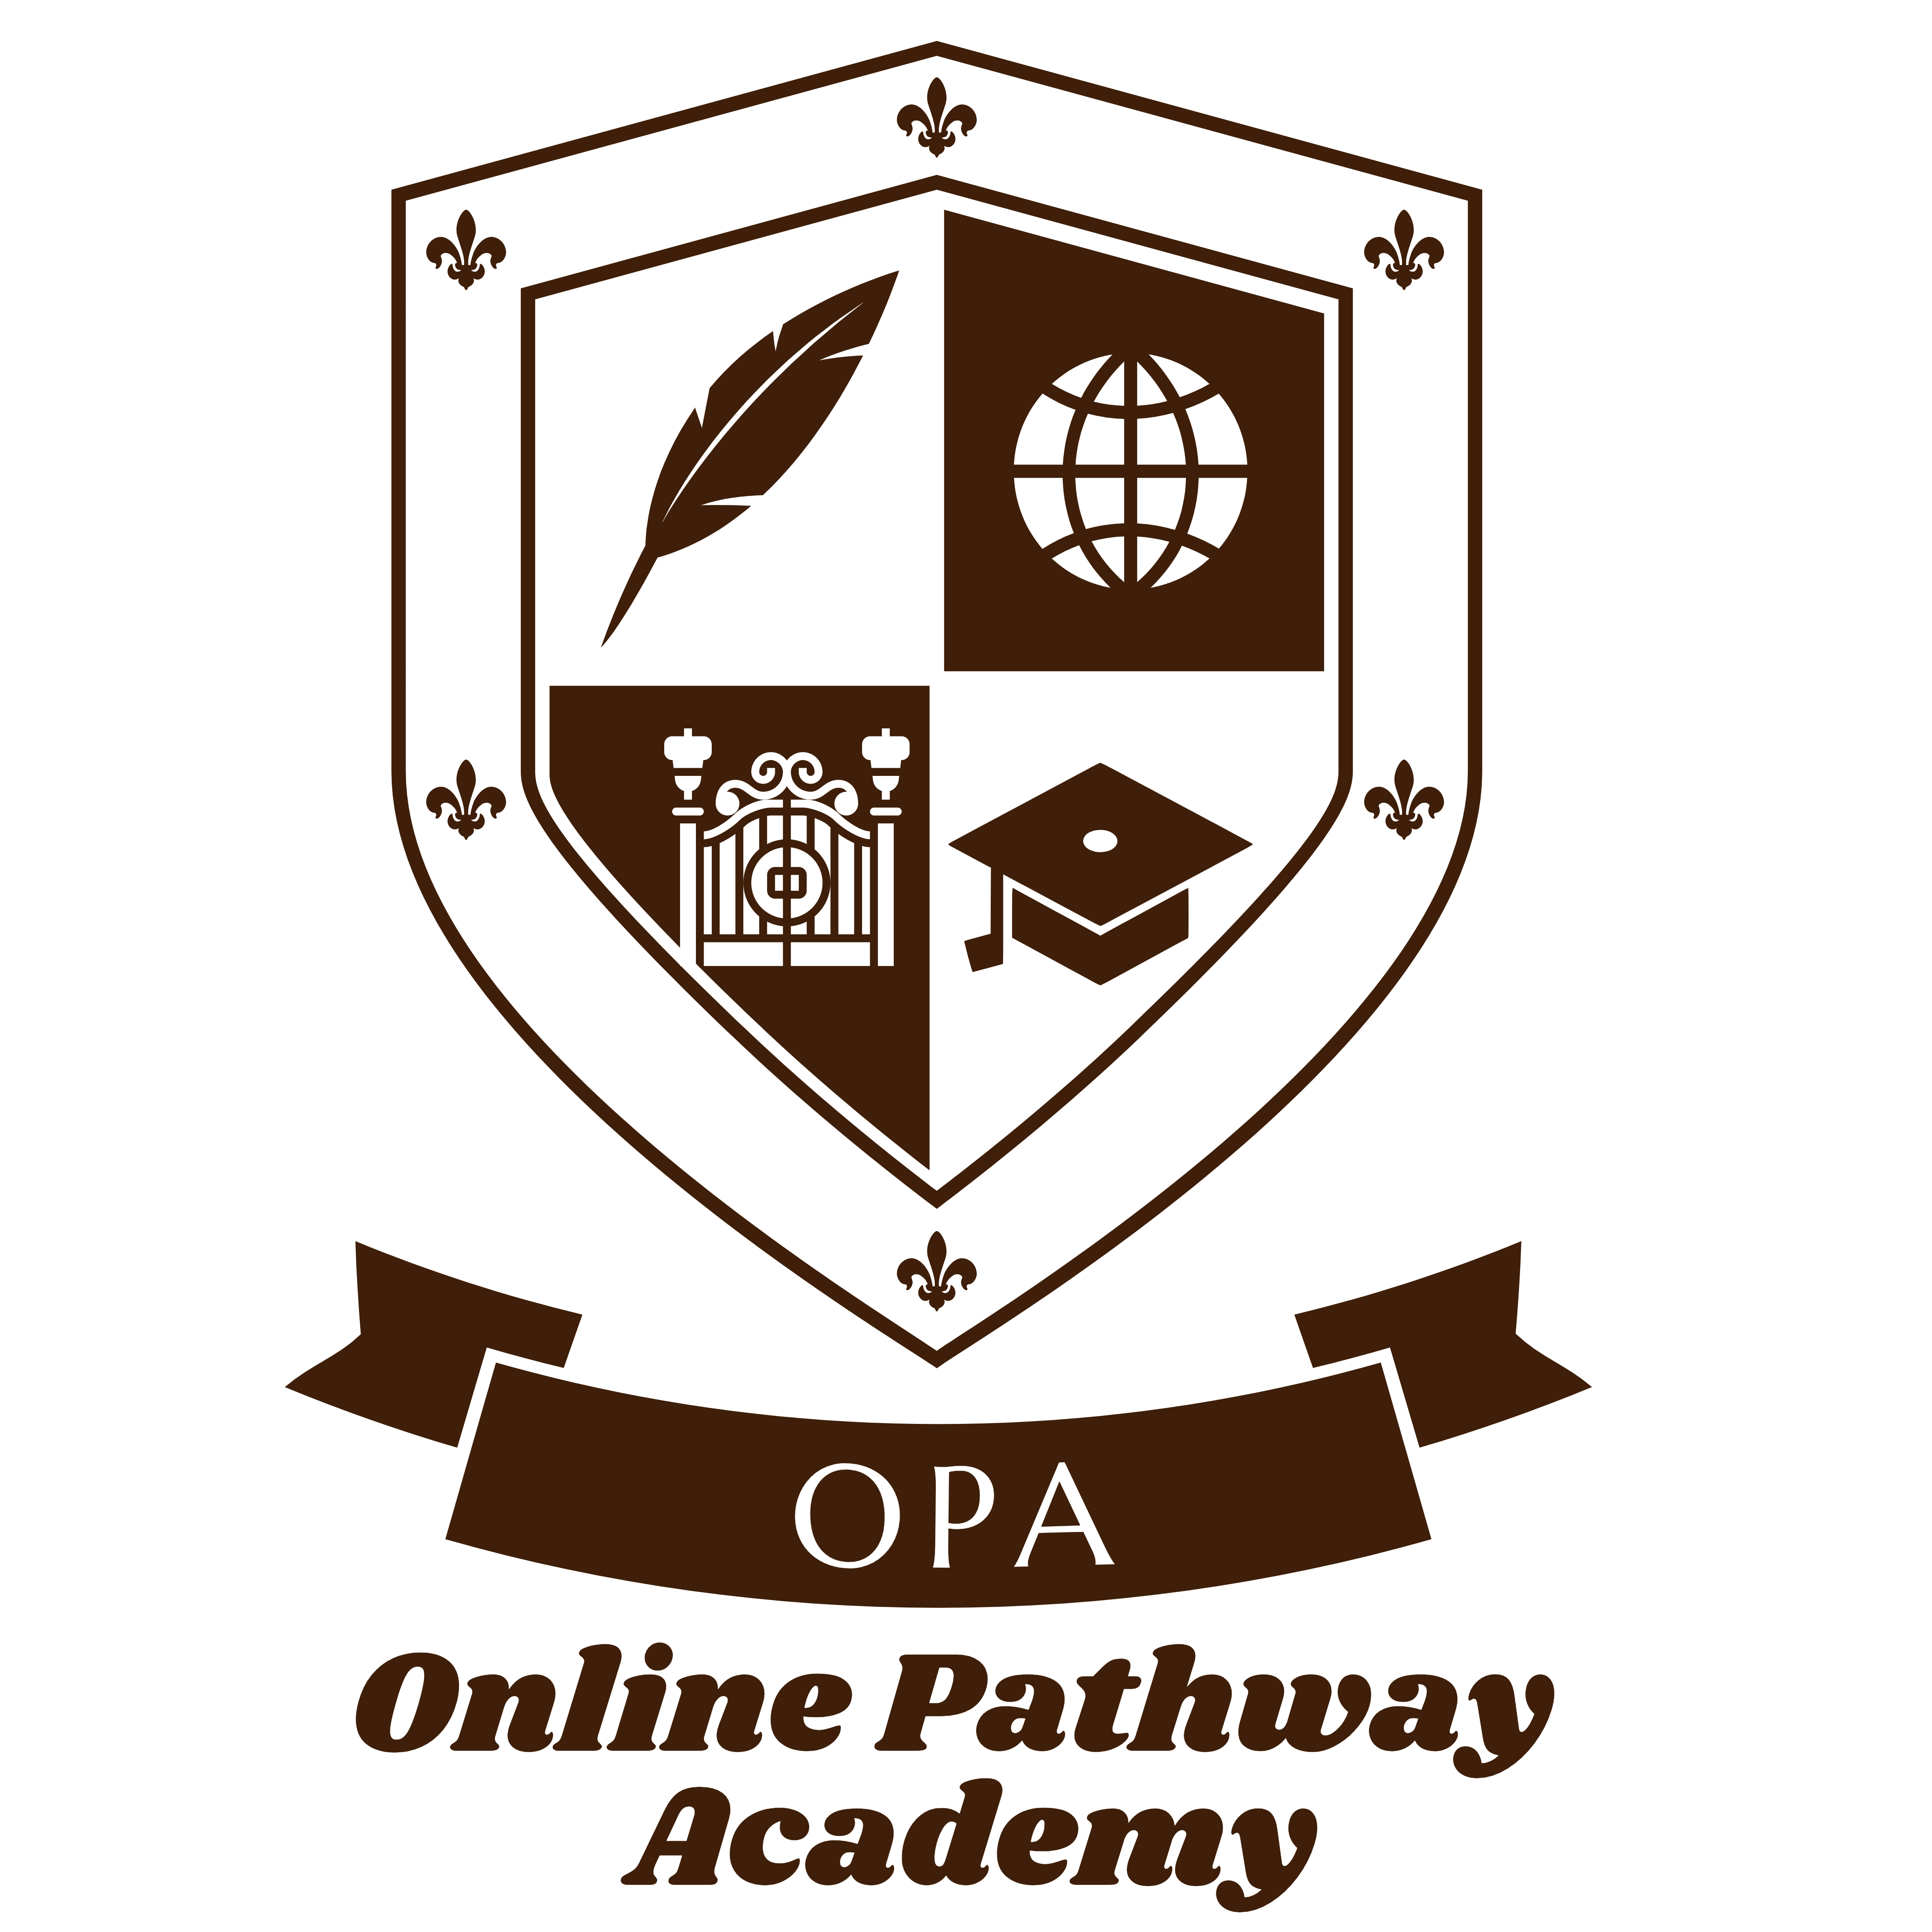 Online Pathway Academy